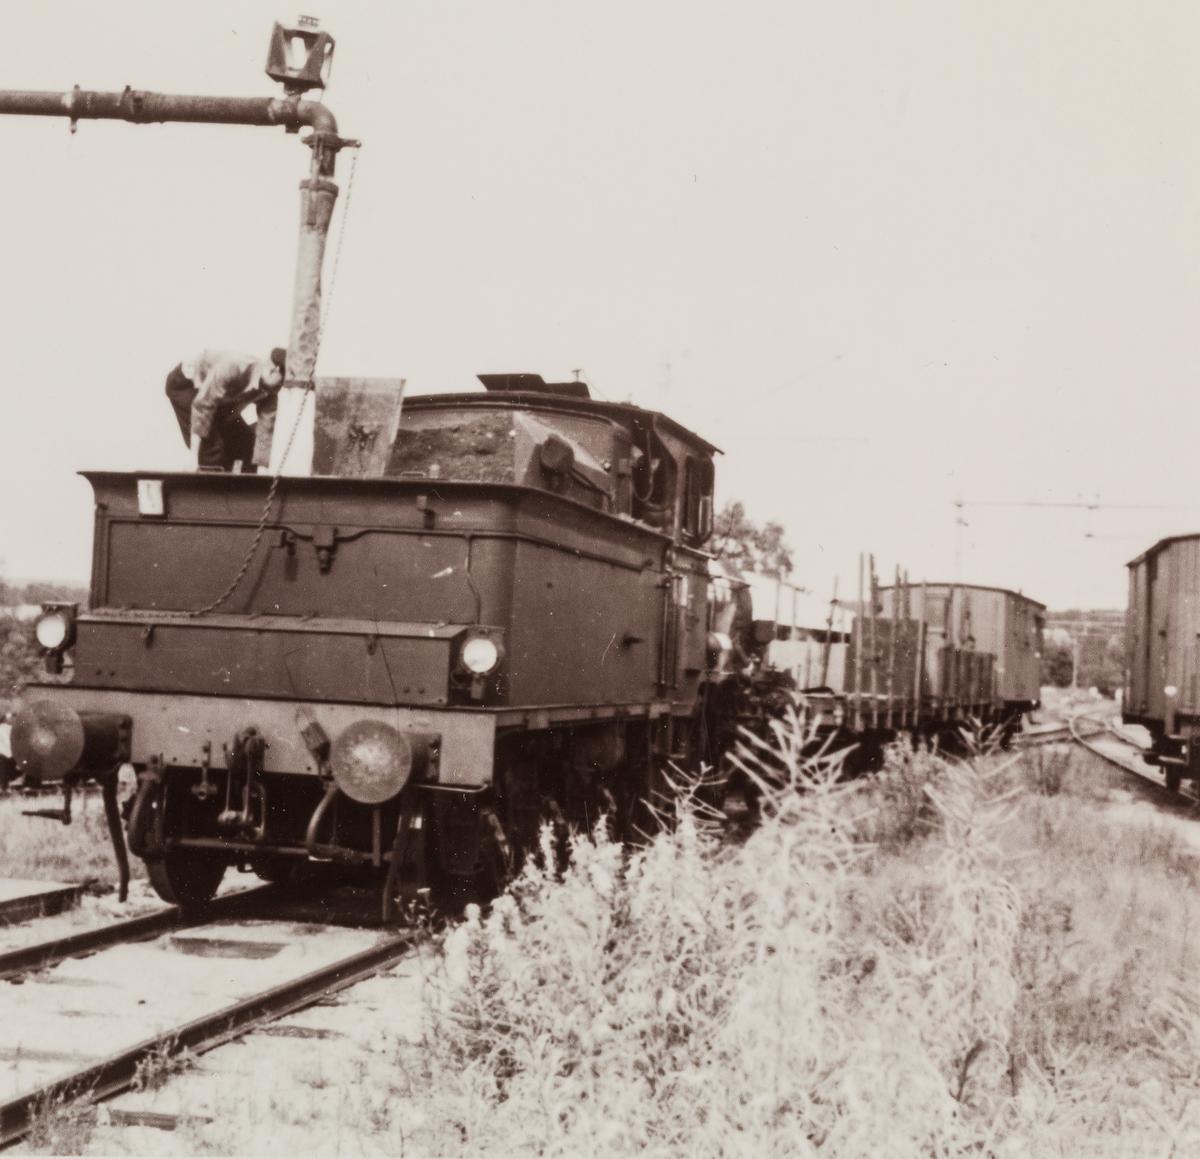 Vannfylling på damplokomotiv type 21 på Skotterud stasjon. Toget trafikkerer Vestmarkalinjen, Skotterud-Vestmarka.